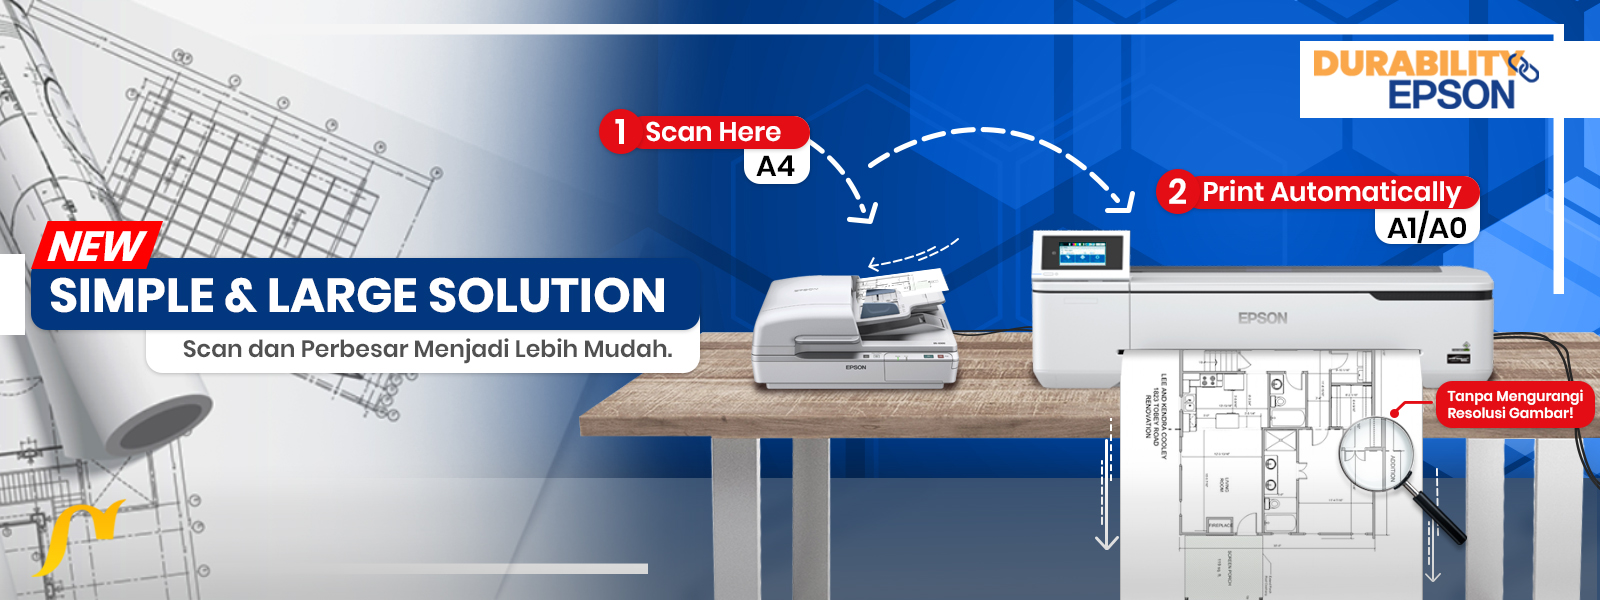 epson technical printer with scanner slider